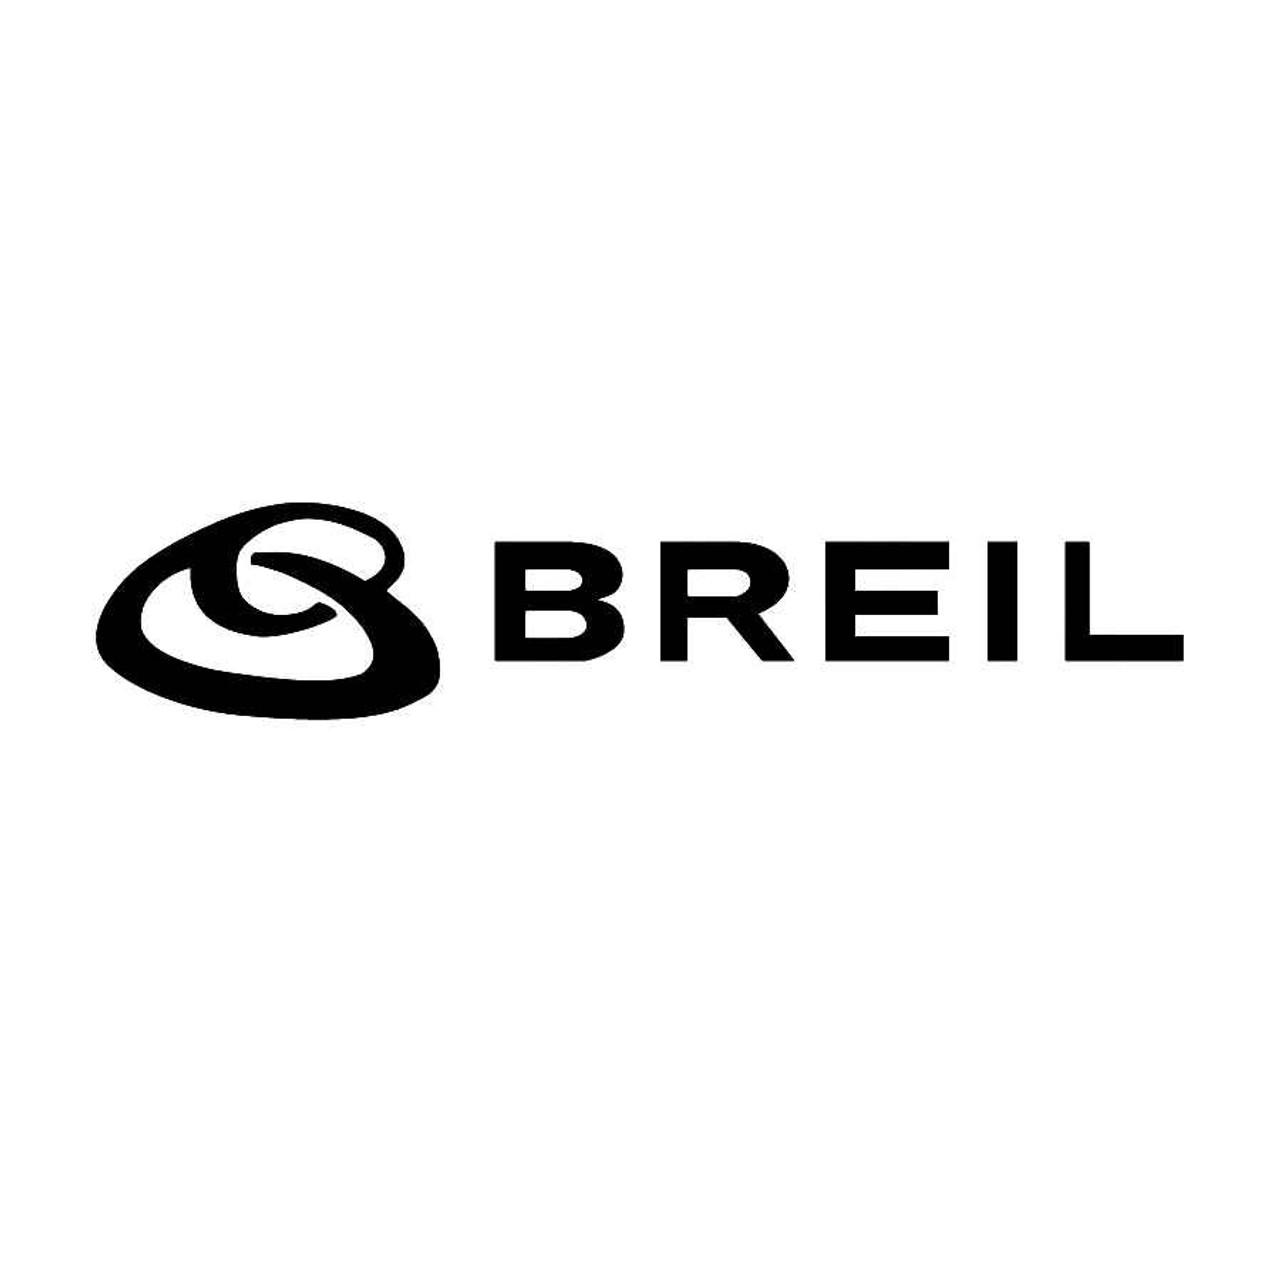 Breil Exhaust Decals Vinl Decal Car Graphics